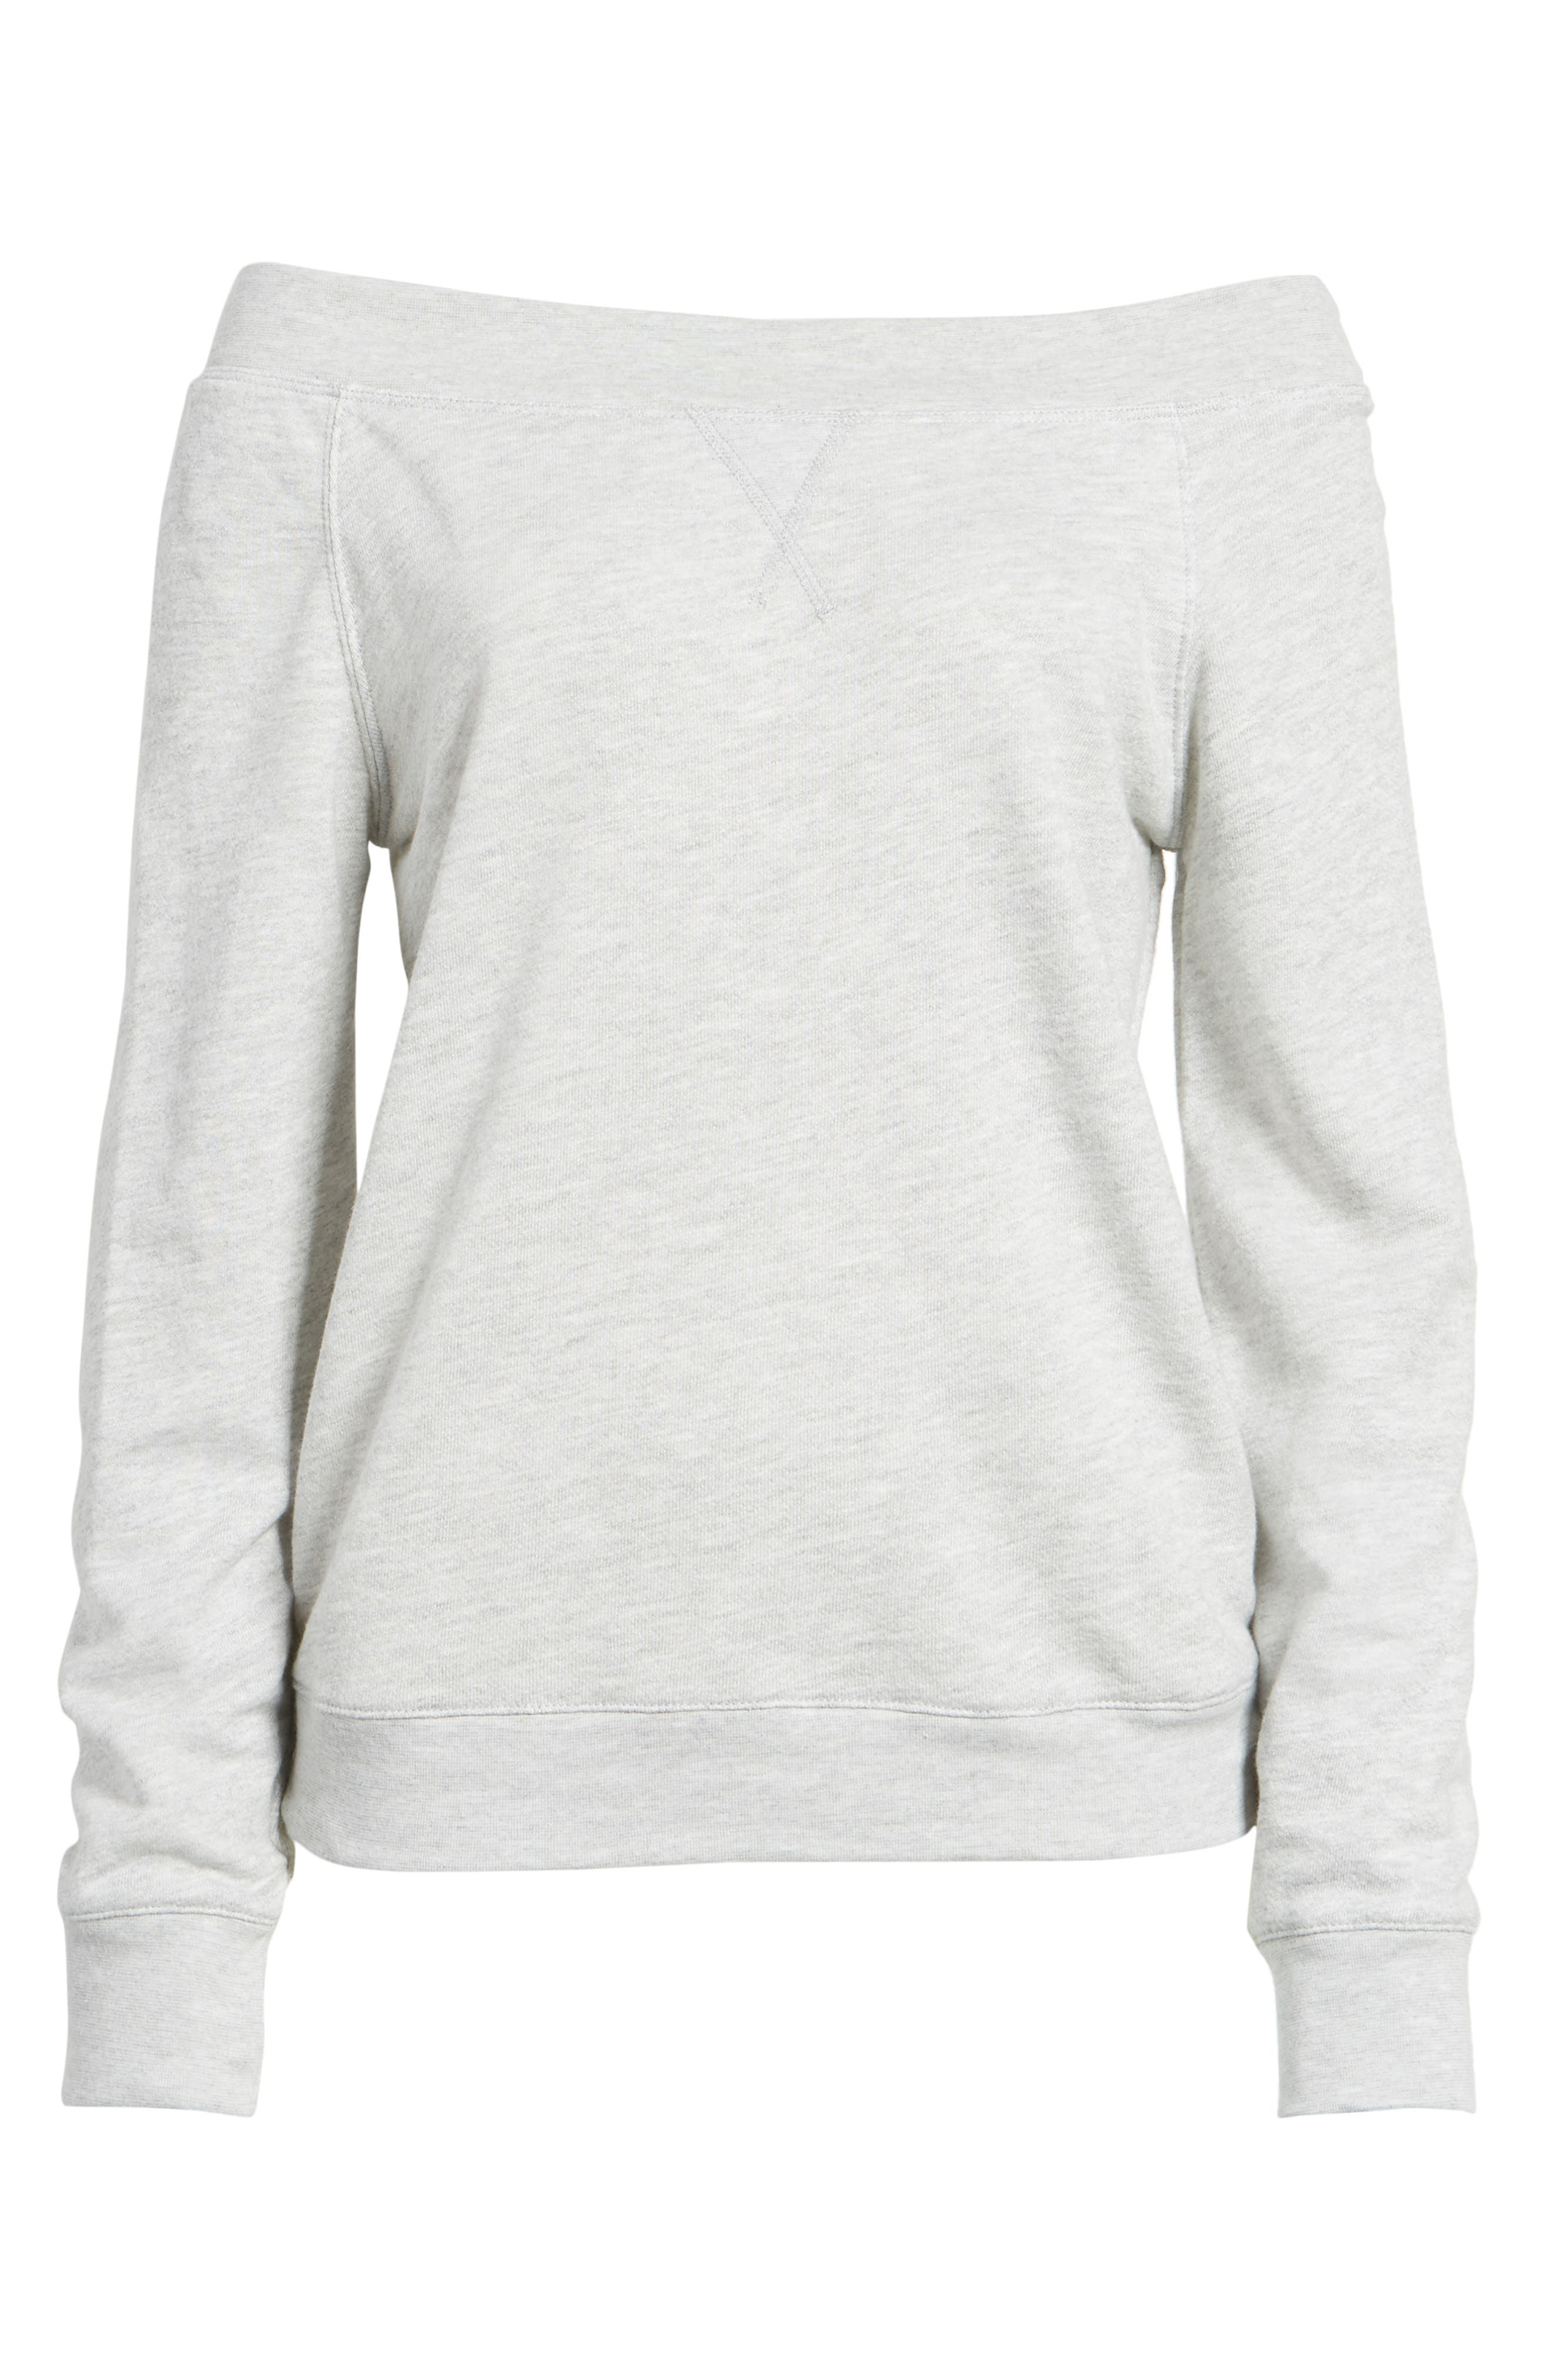 Off the Shoulder Sweatshirt,                             Alternate thumbnail 6, color,                             Grey Heather